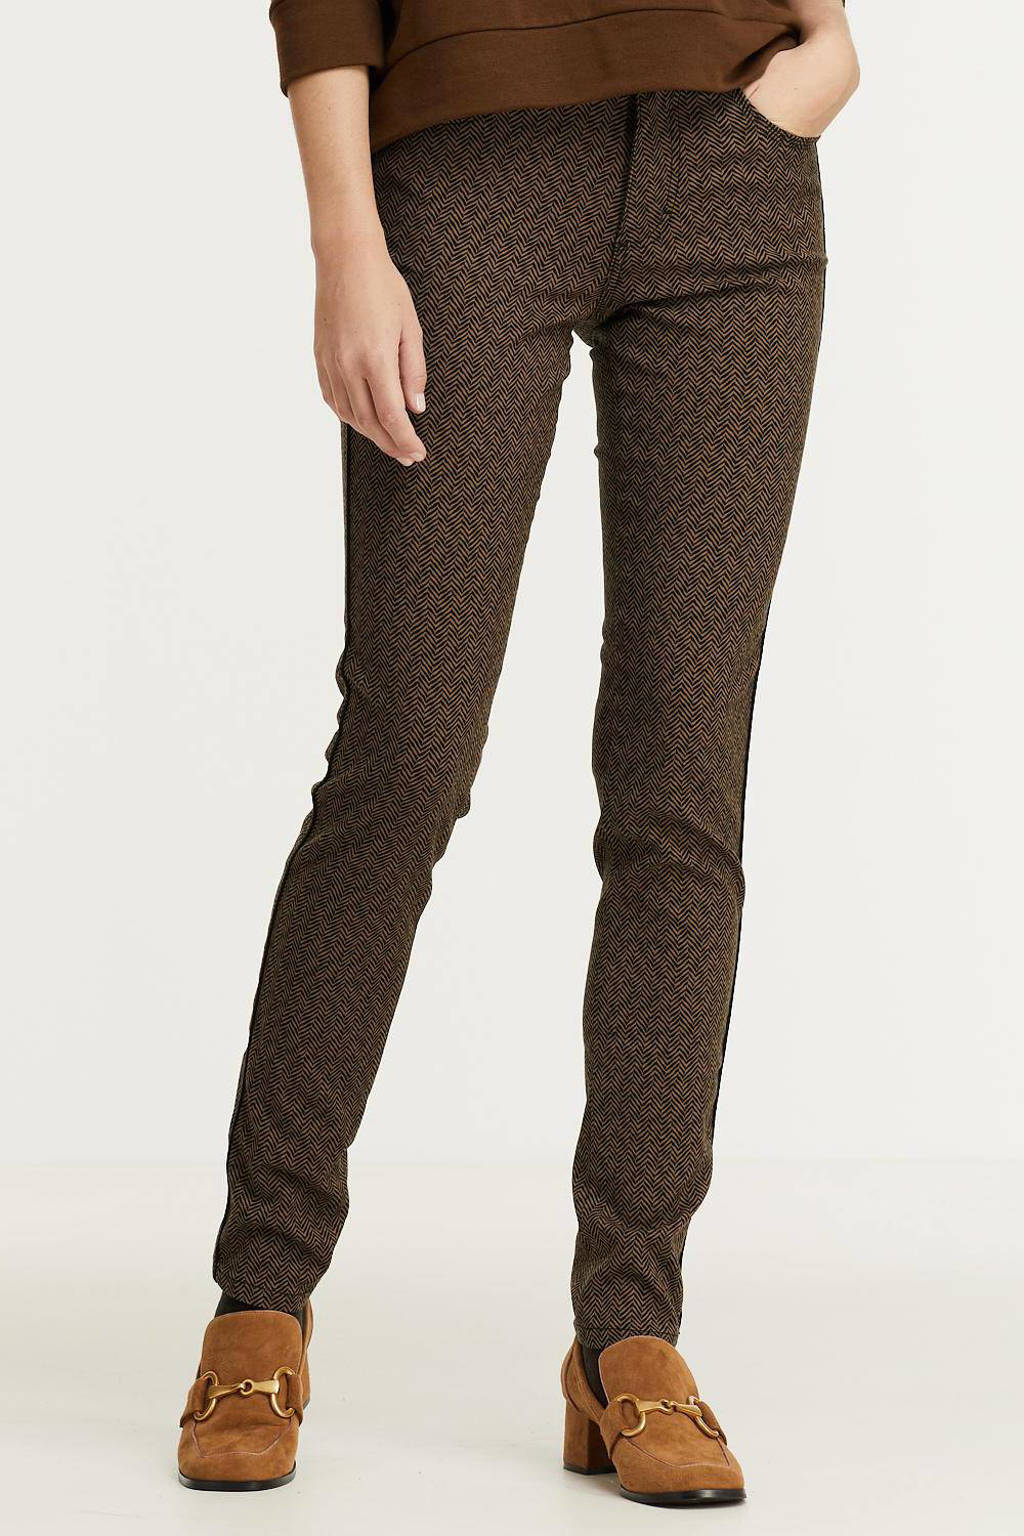 Para Mi high waist skinny broek Celine (Piping) Herringbone Jacquard met all over print bruin/zwart, Bruin/zwart